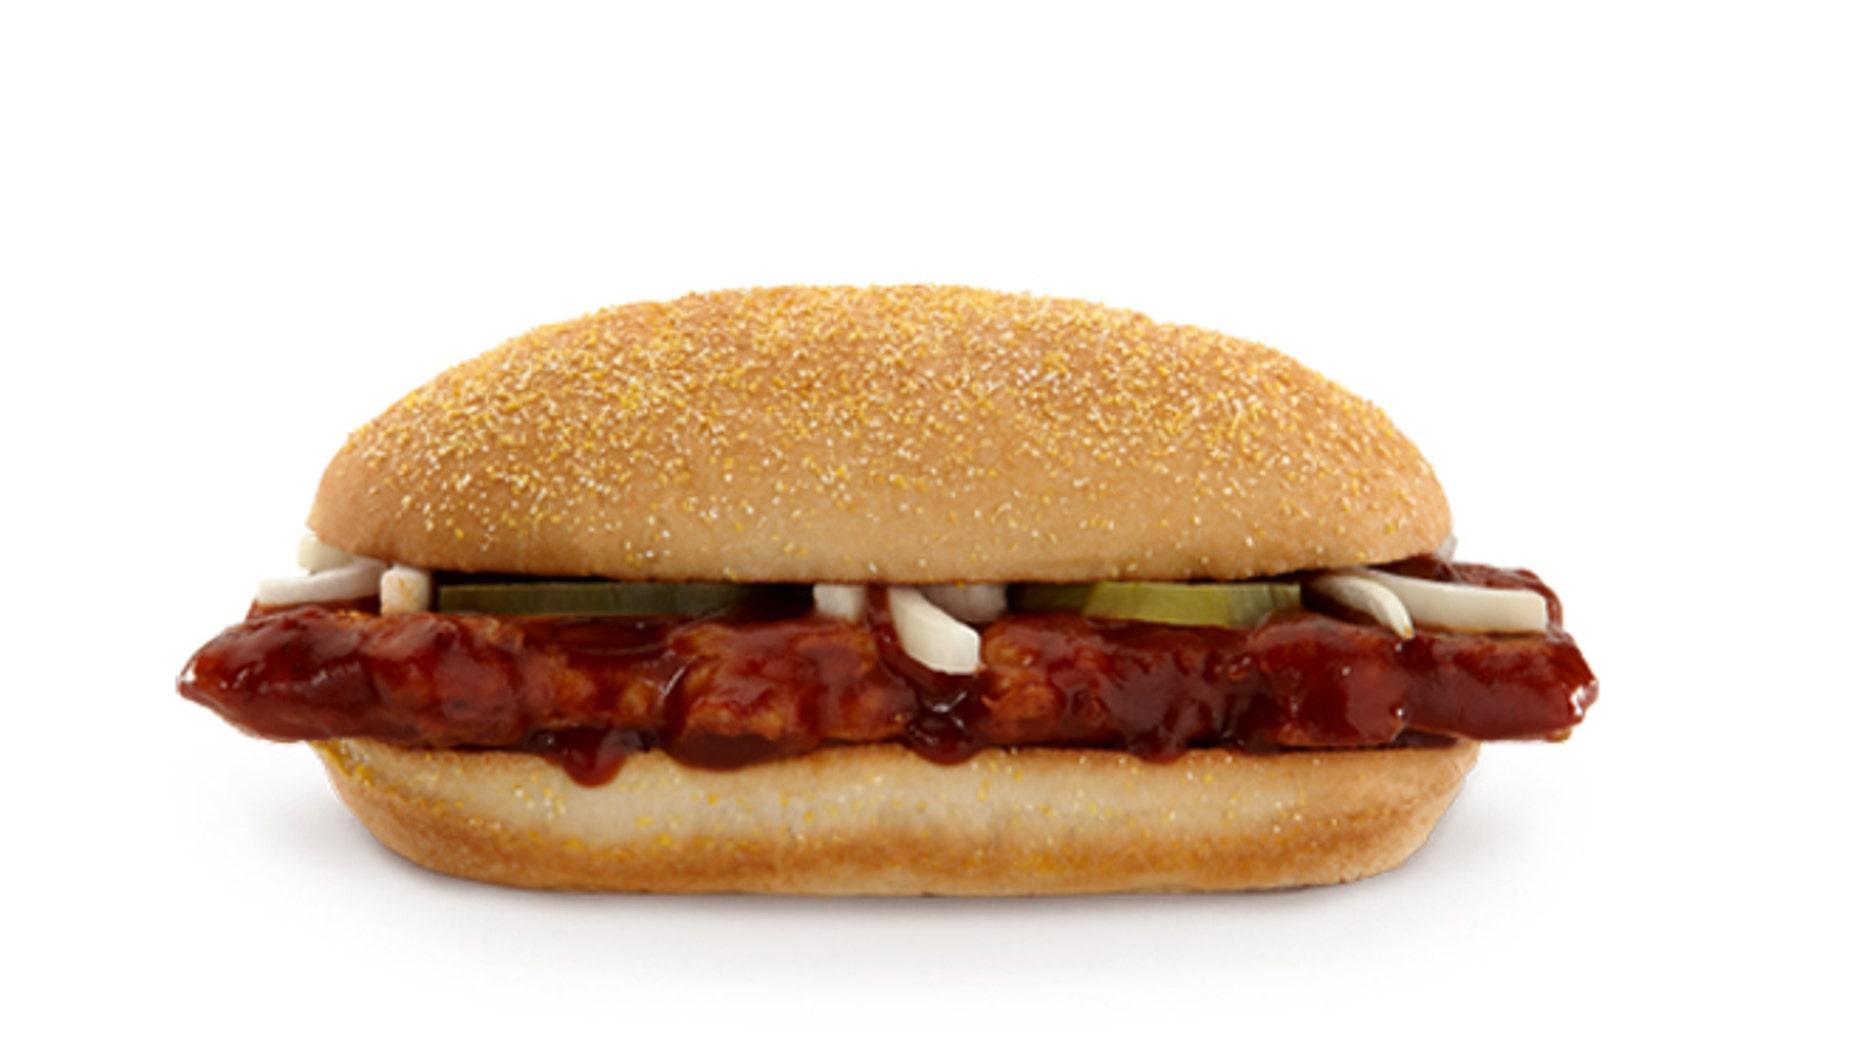 McDonald says the McRib won't be available nationally this year.